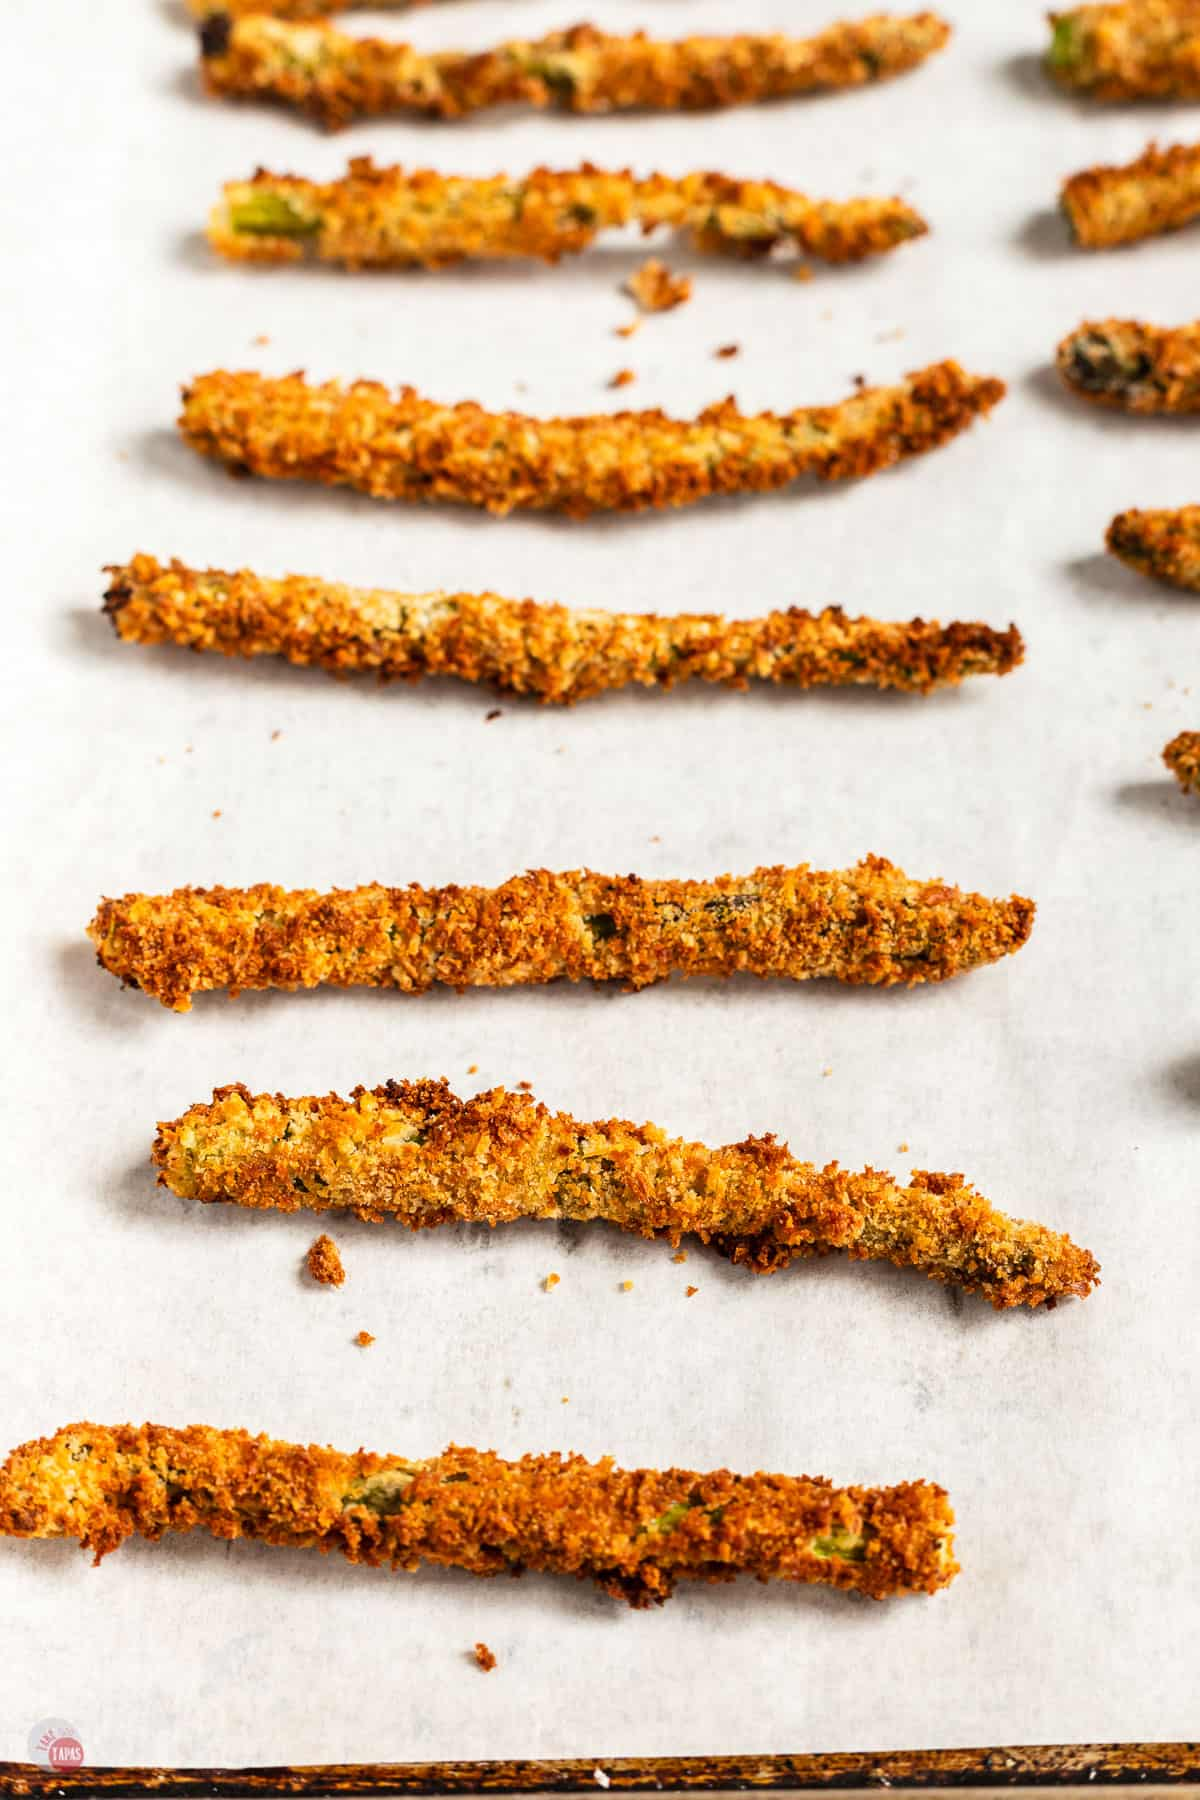 asparagus fries on a baking sheet